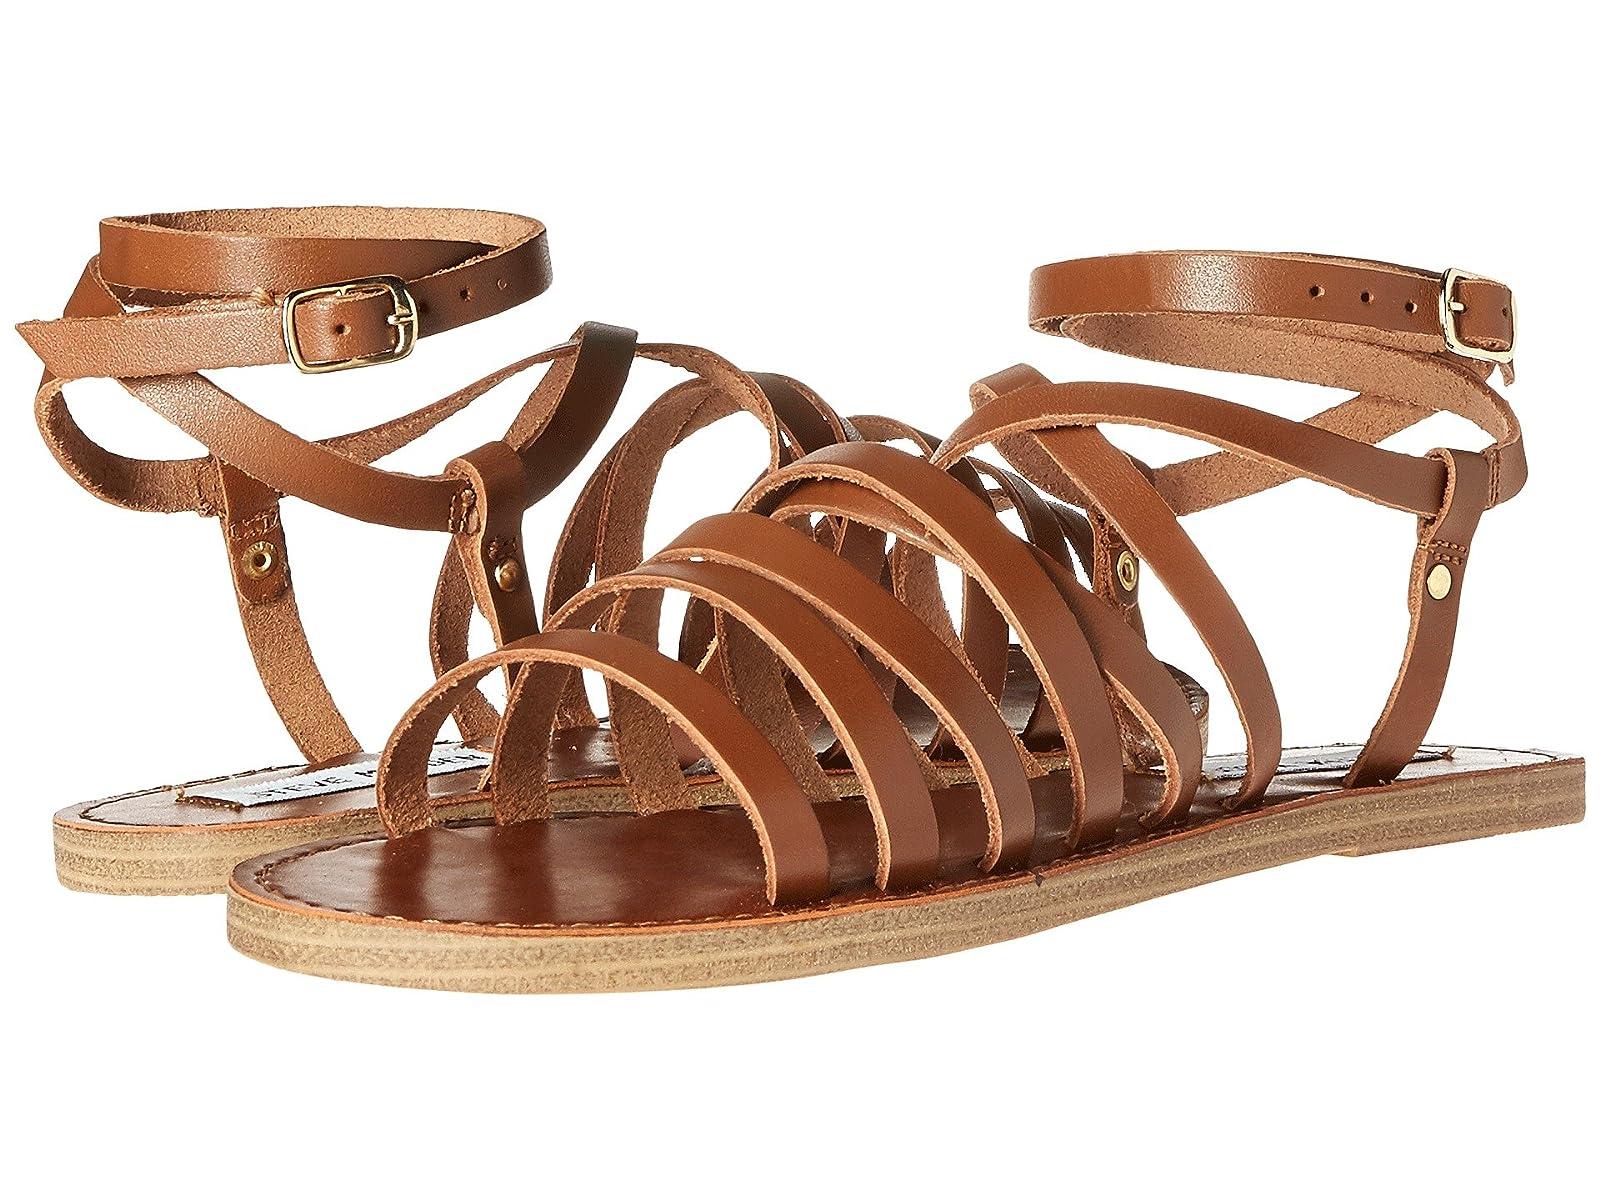 Steve Madden GaleaCheap and distinctive eye-catching shoes